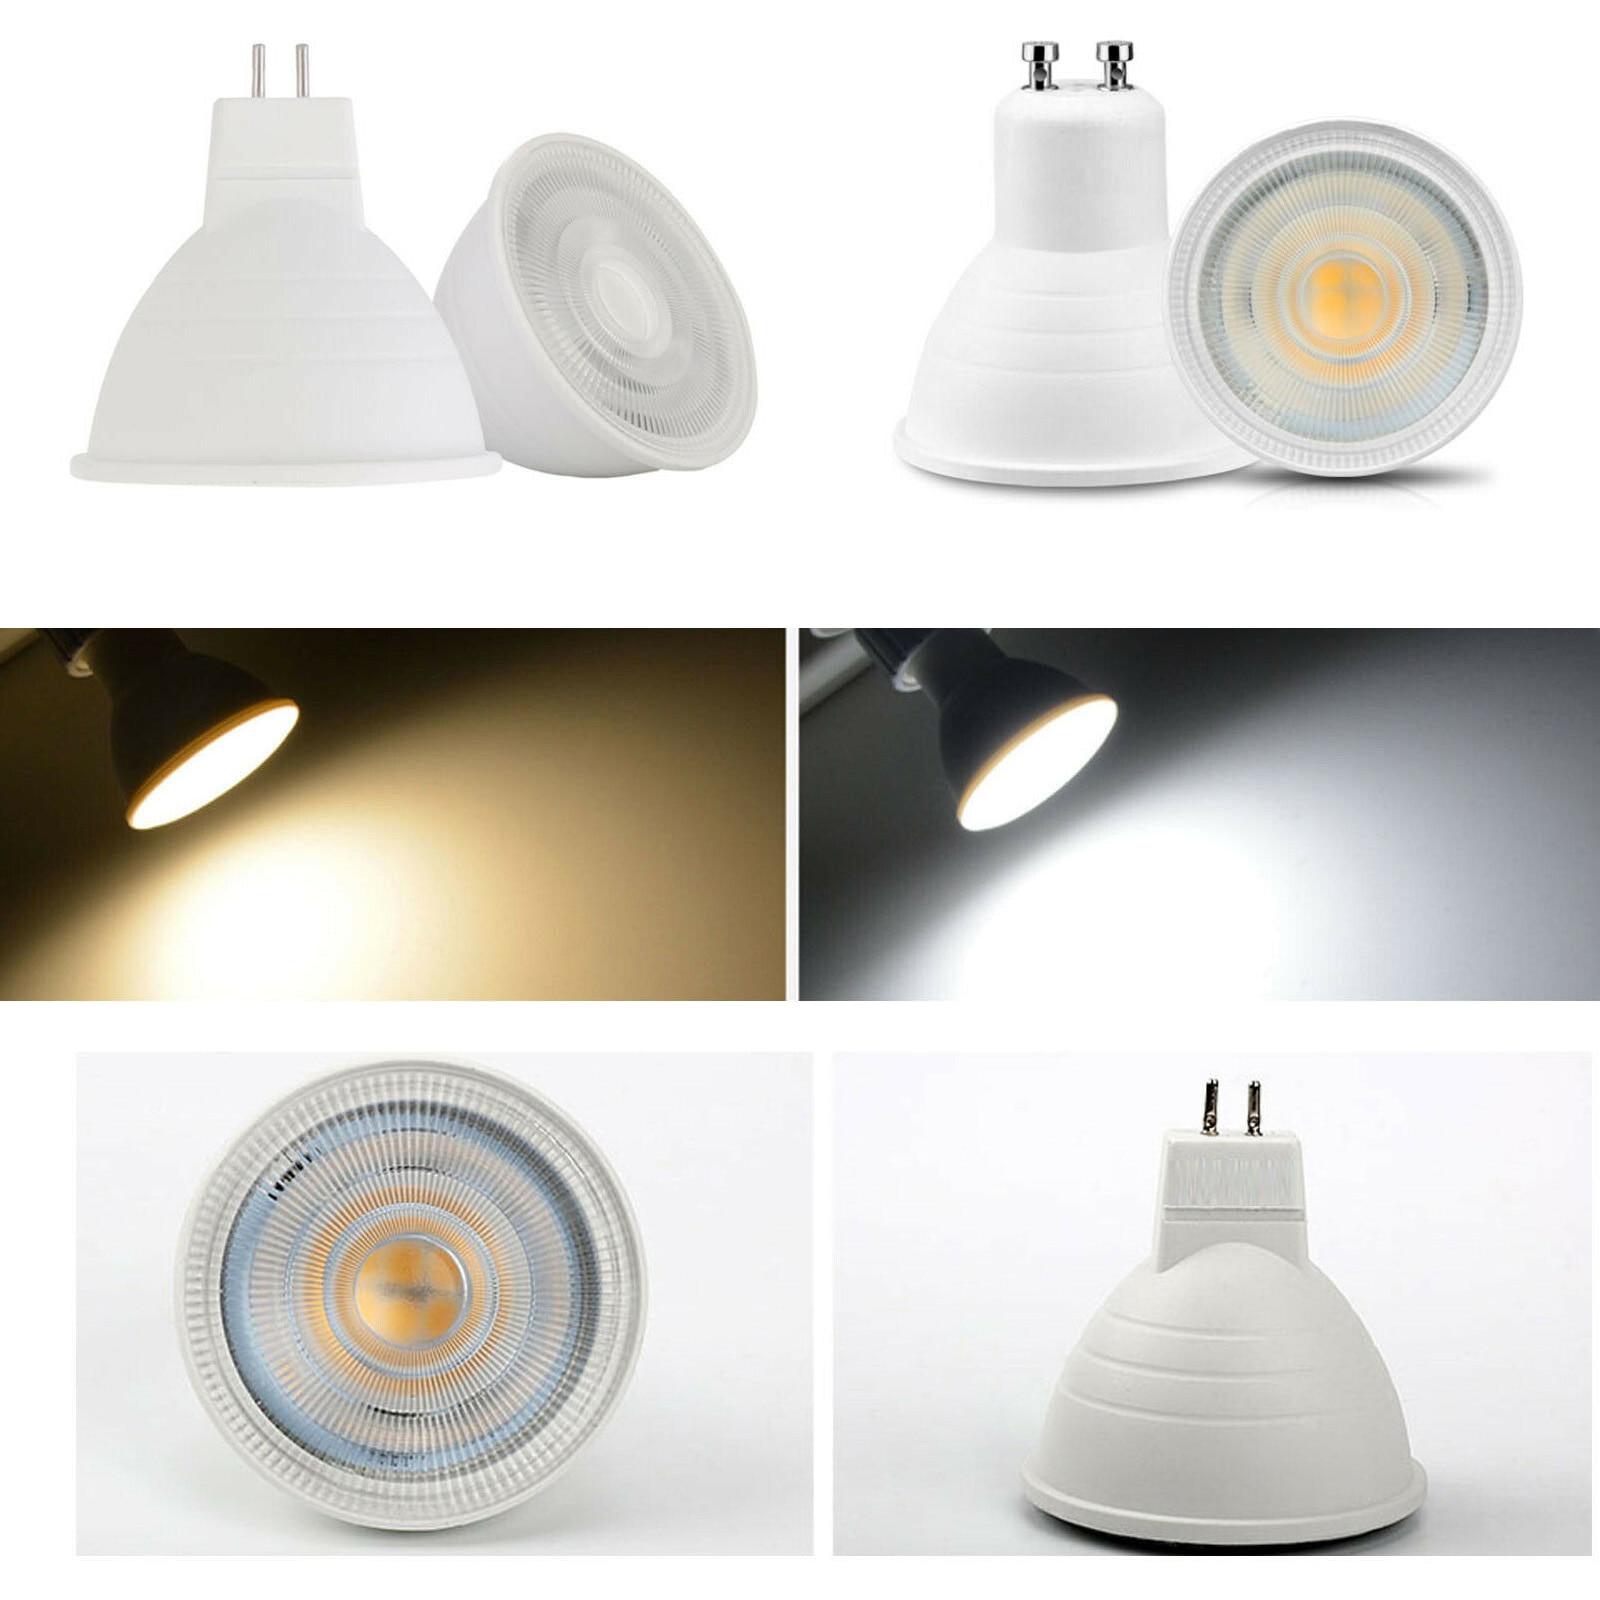 Dimmable LED Bulb GU10 Spotlight 7W 220V MR16 GU5.3 LED Lamp COB Chip 30 Degree Beam Angle For Home Office Decoration Lamp Light